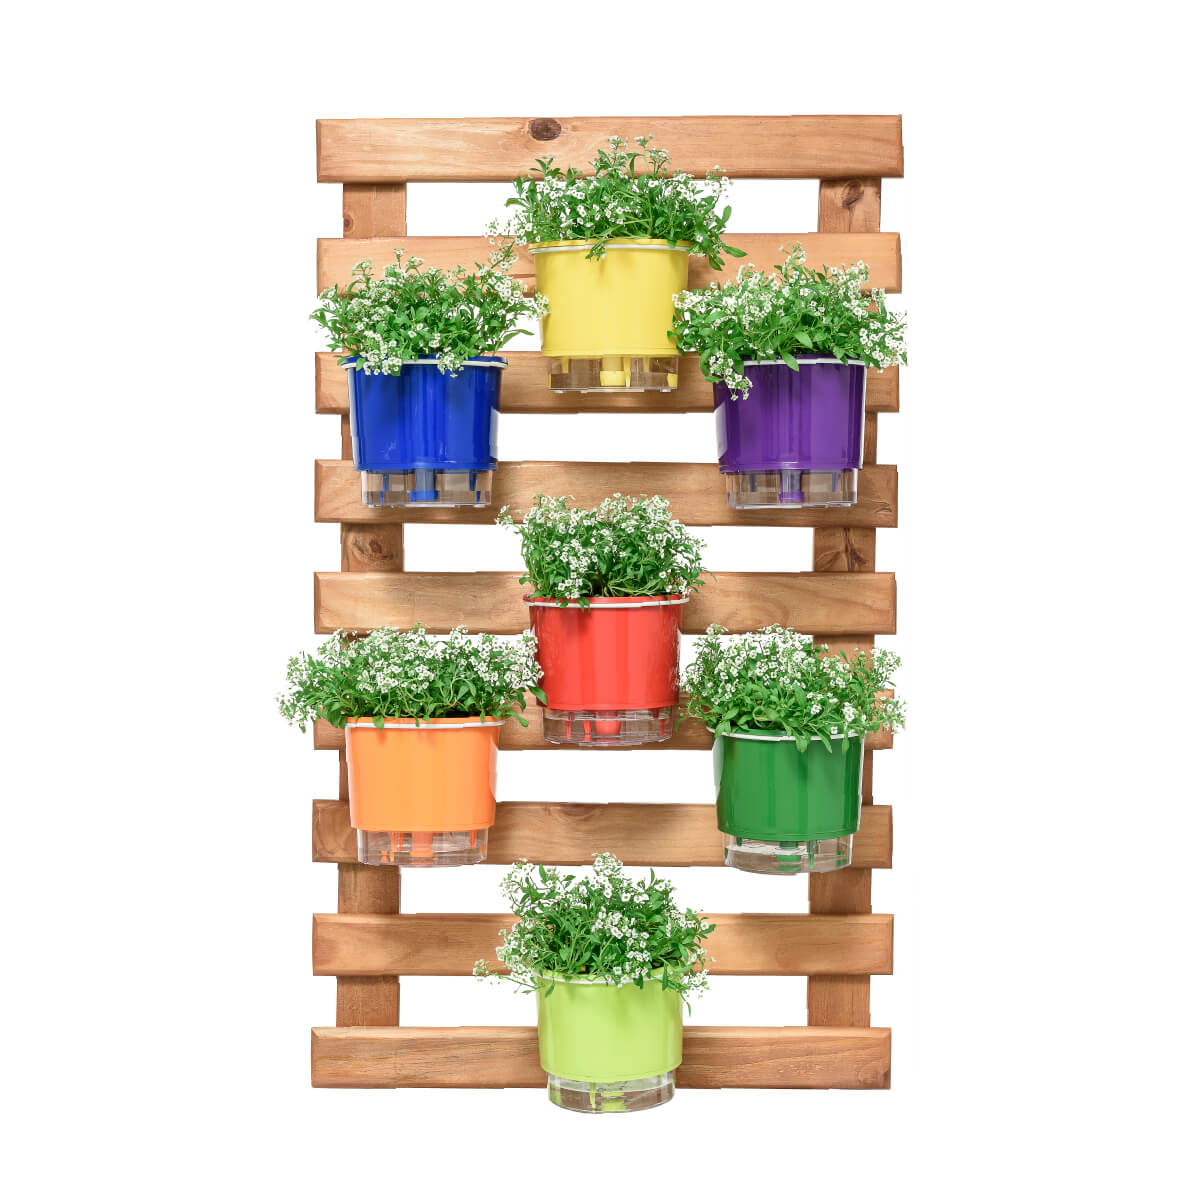 Kit Horta Vertical 60cm x 100cm com 7 Vasos Rainbow Médio (N03)  - Loja Raiz